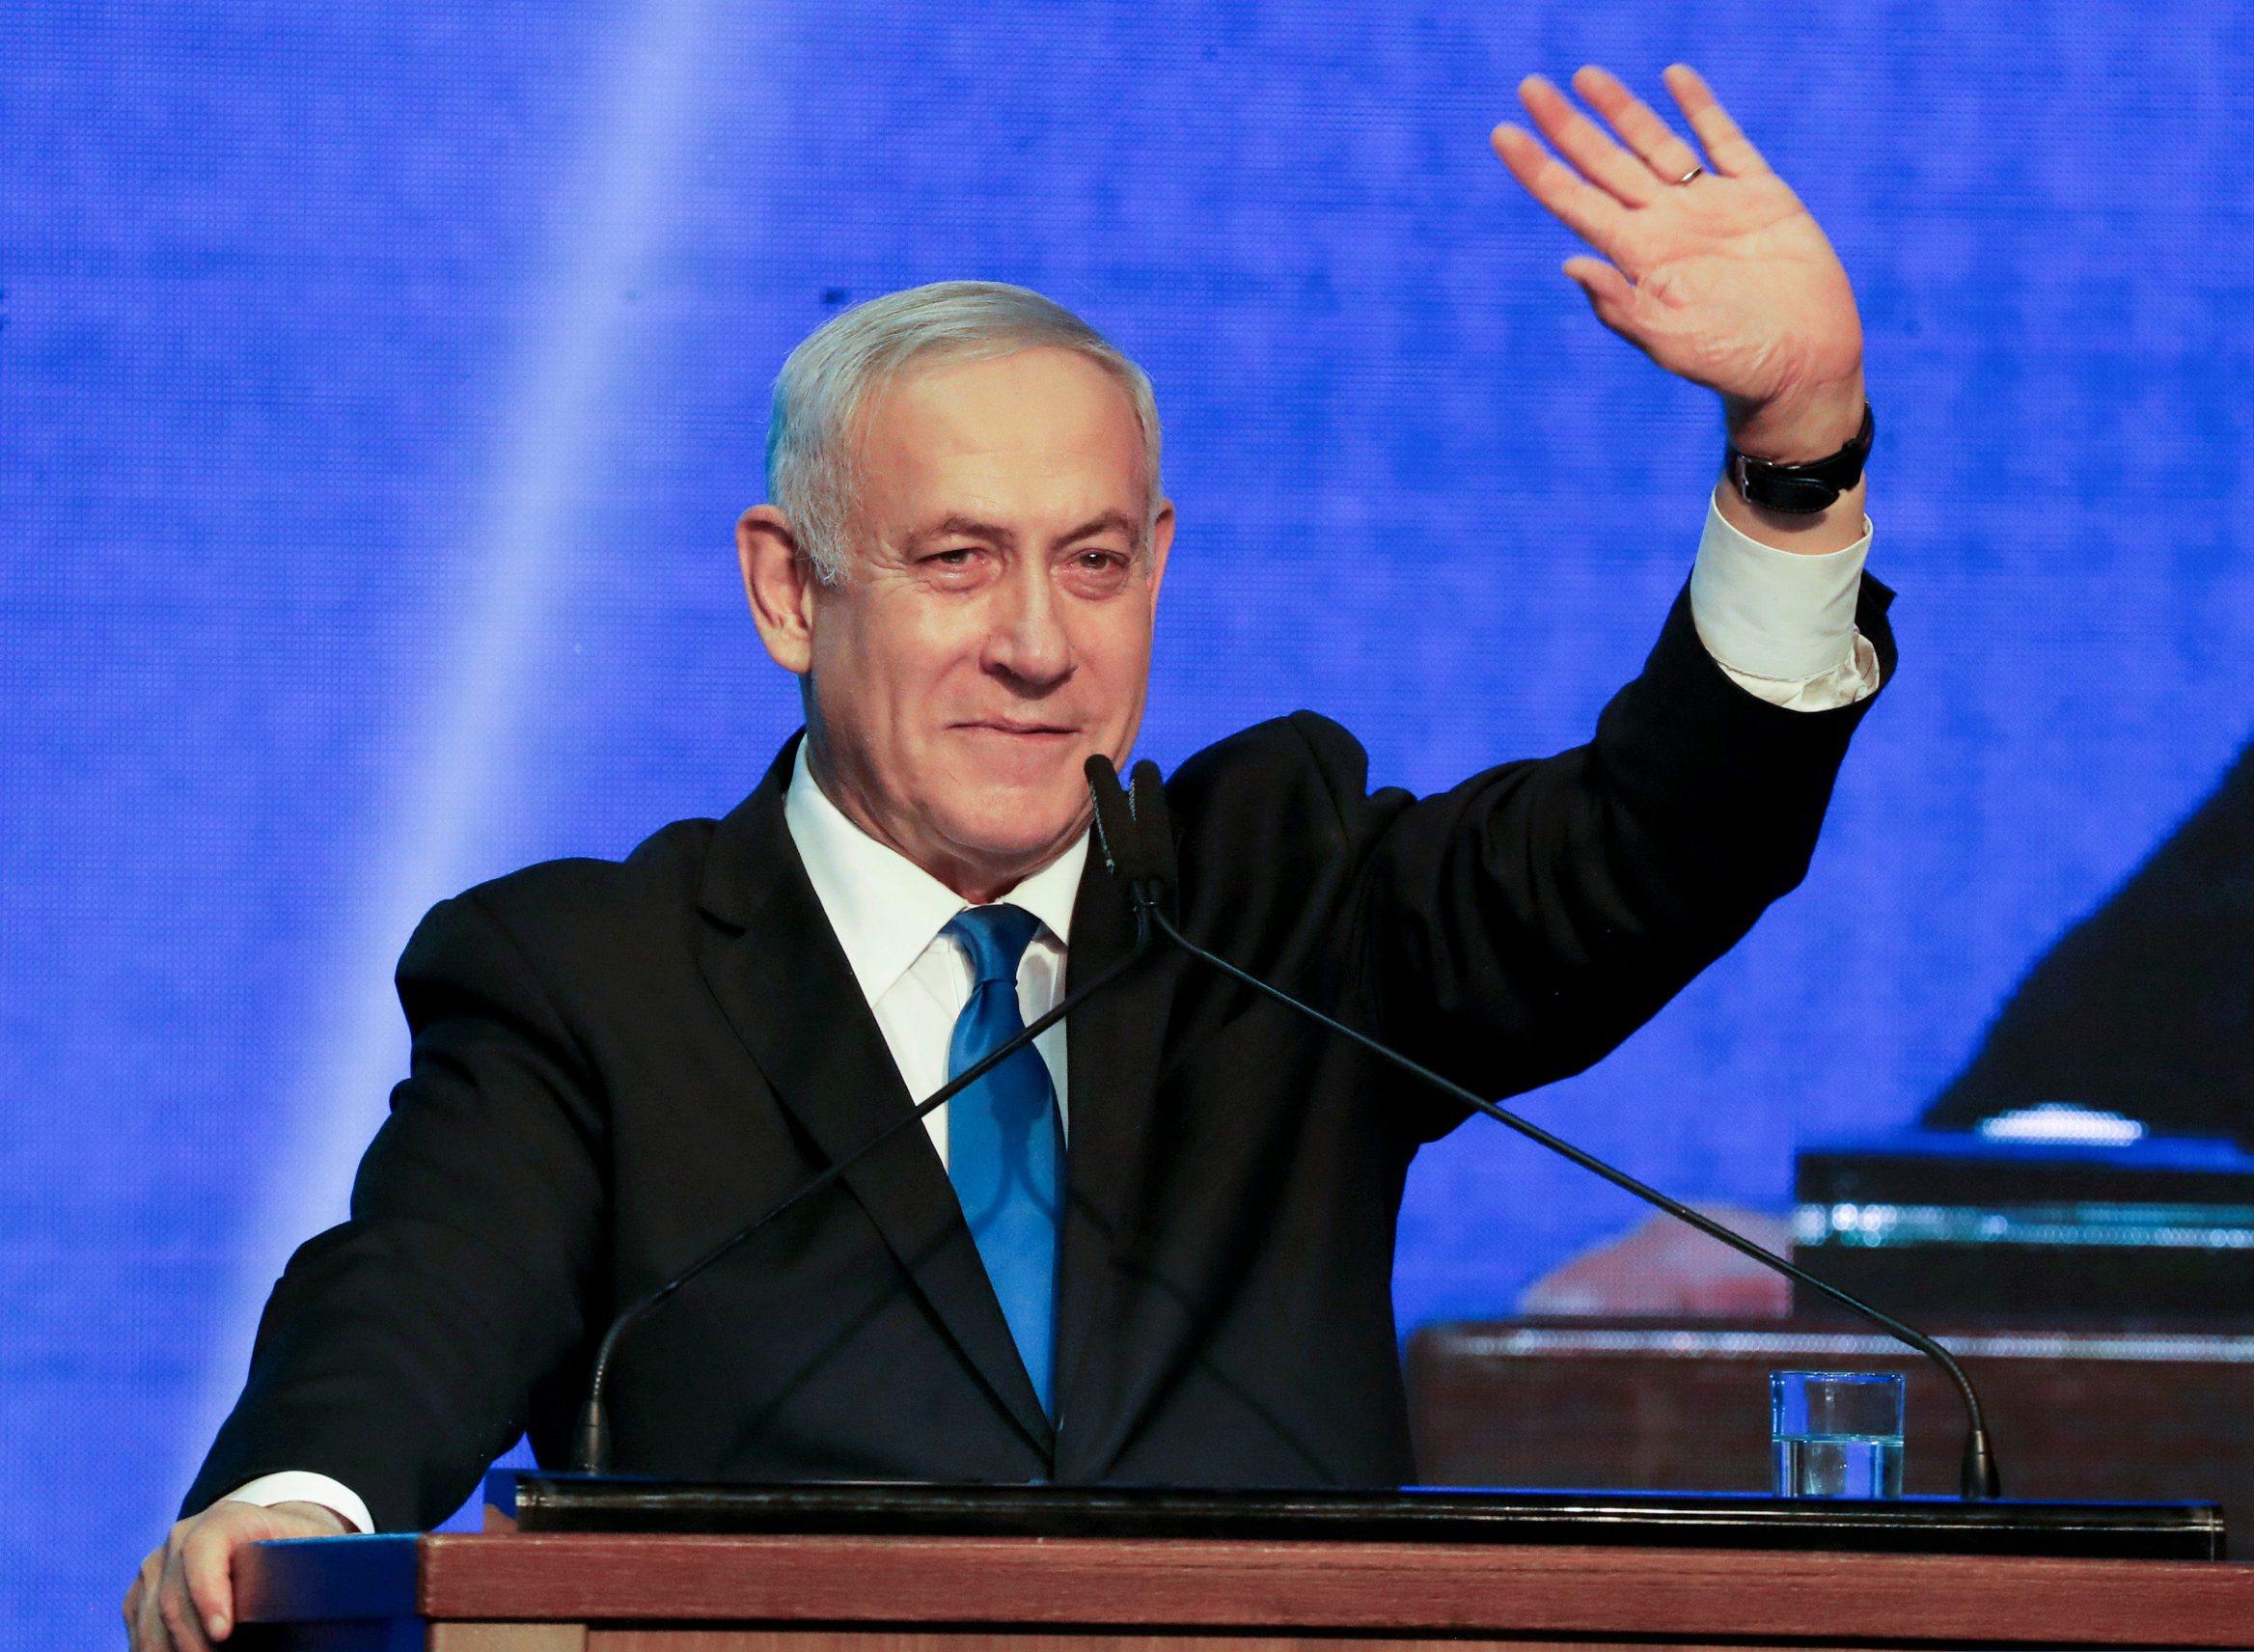 2019-09-18T000000Z_637432482_RC1F05835A30_RTRMADP_3_ISRAEL-ELECTION-LIKUD-HEADQUARTERS